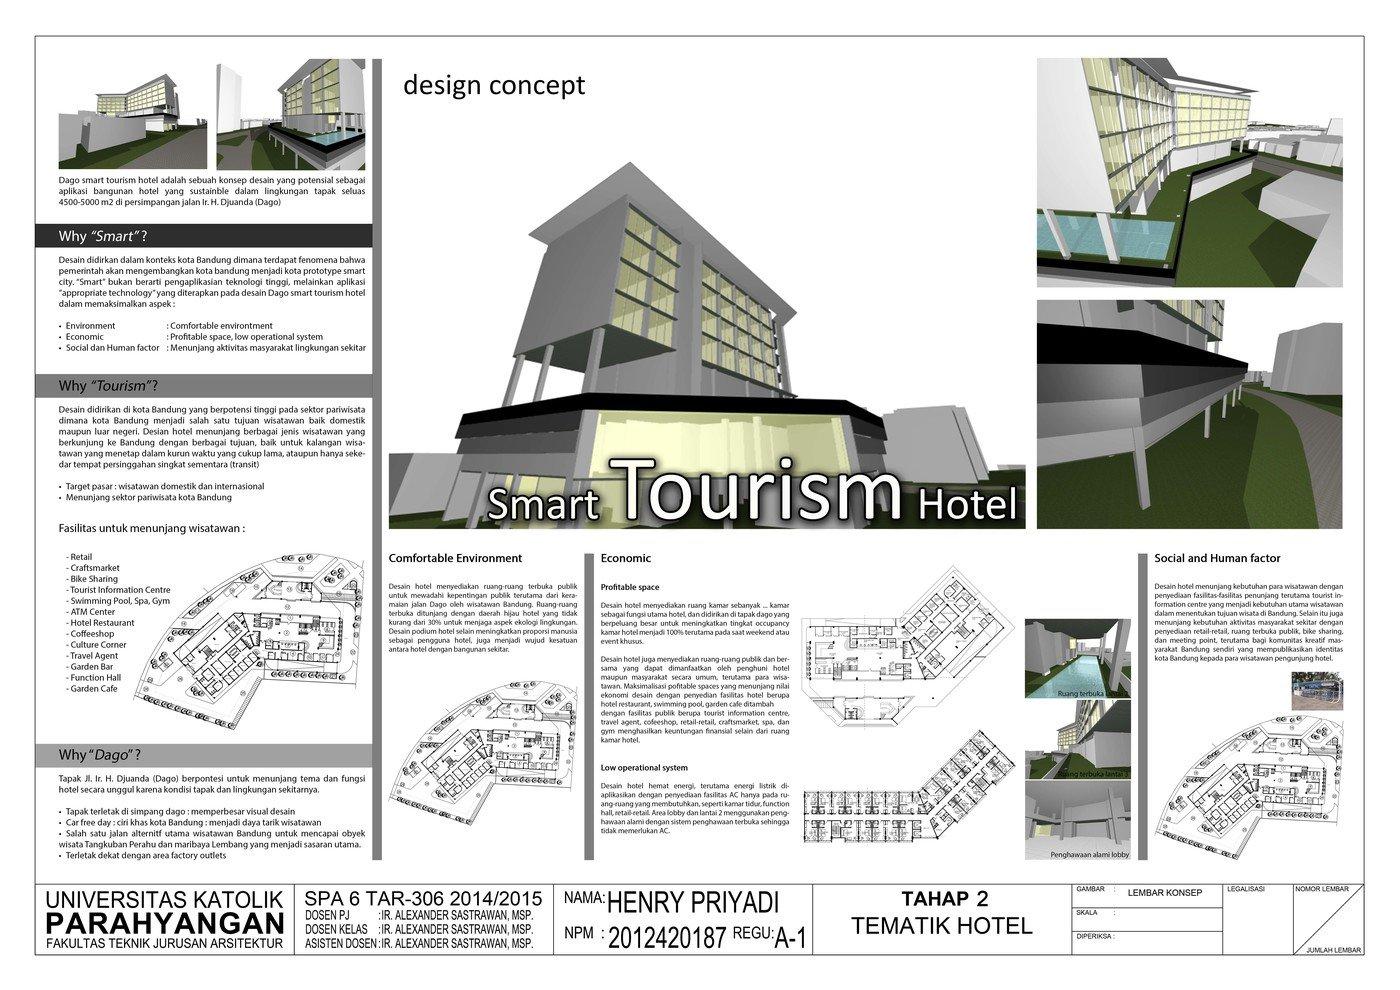 Dago smart tourism hotel by pius henry priyadi at coroflot ccuart Gallery